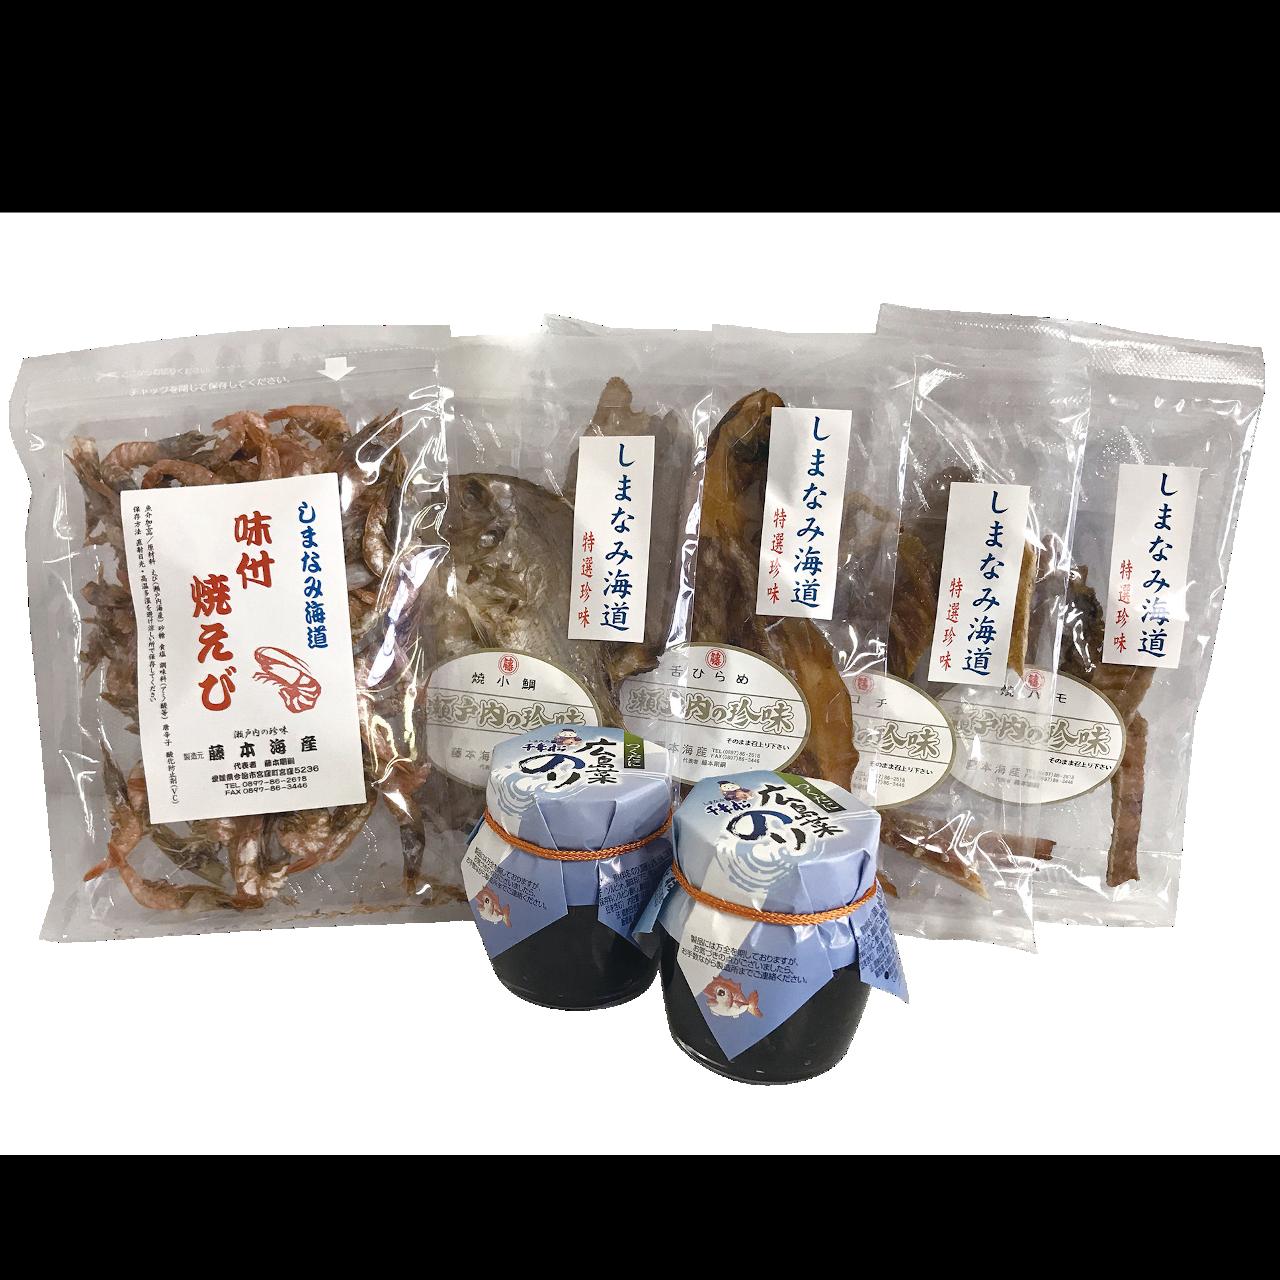 SH-6 手しごと海産珍味・広島菜のりセット